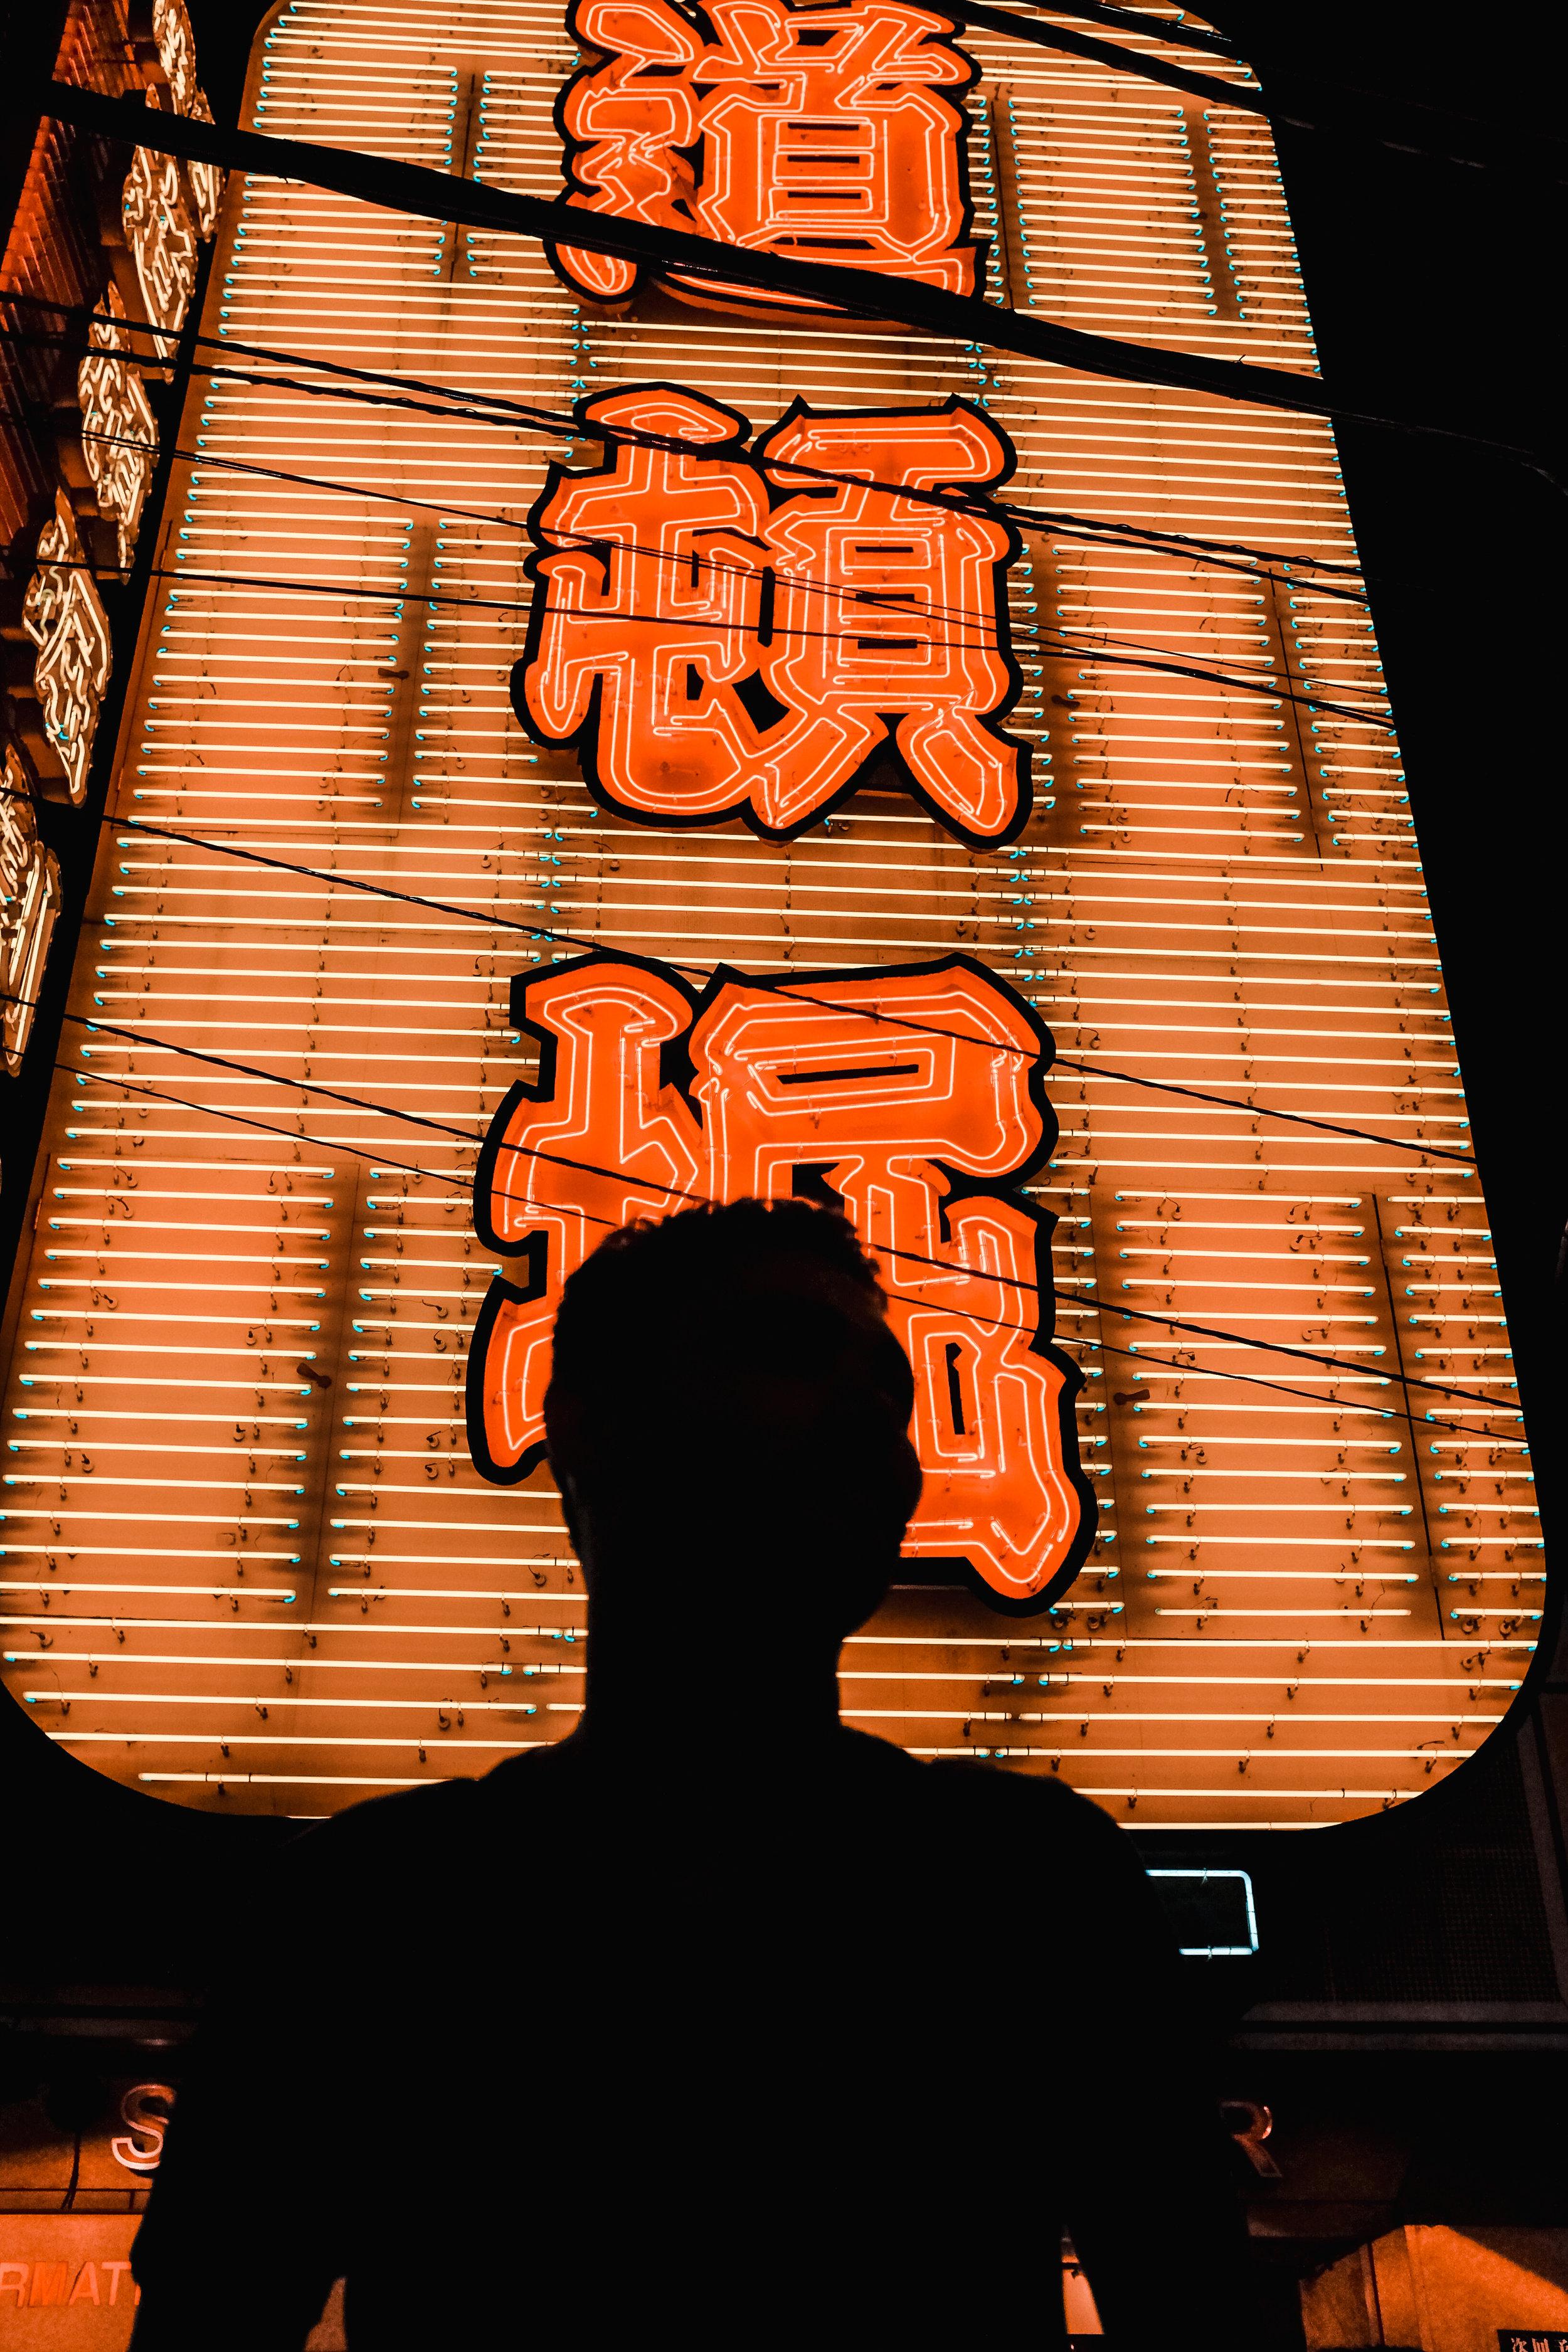 TokyoJapan_2018_AdamDillon_DSCF9265.jpg